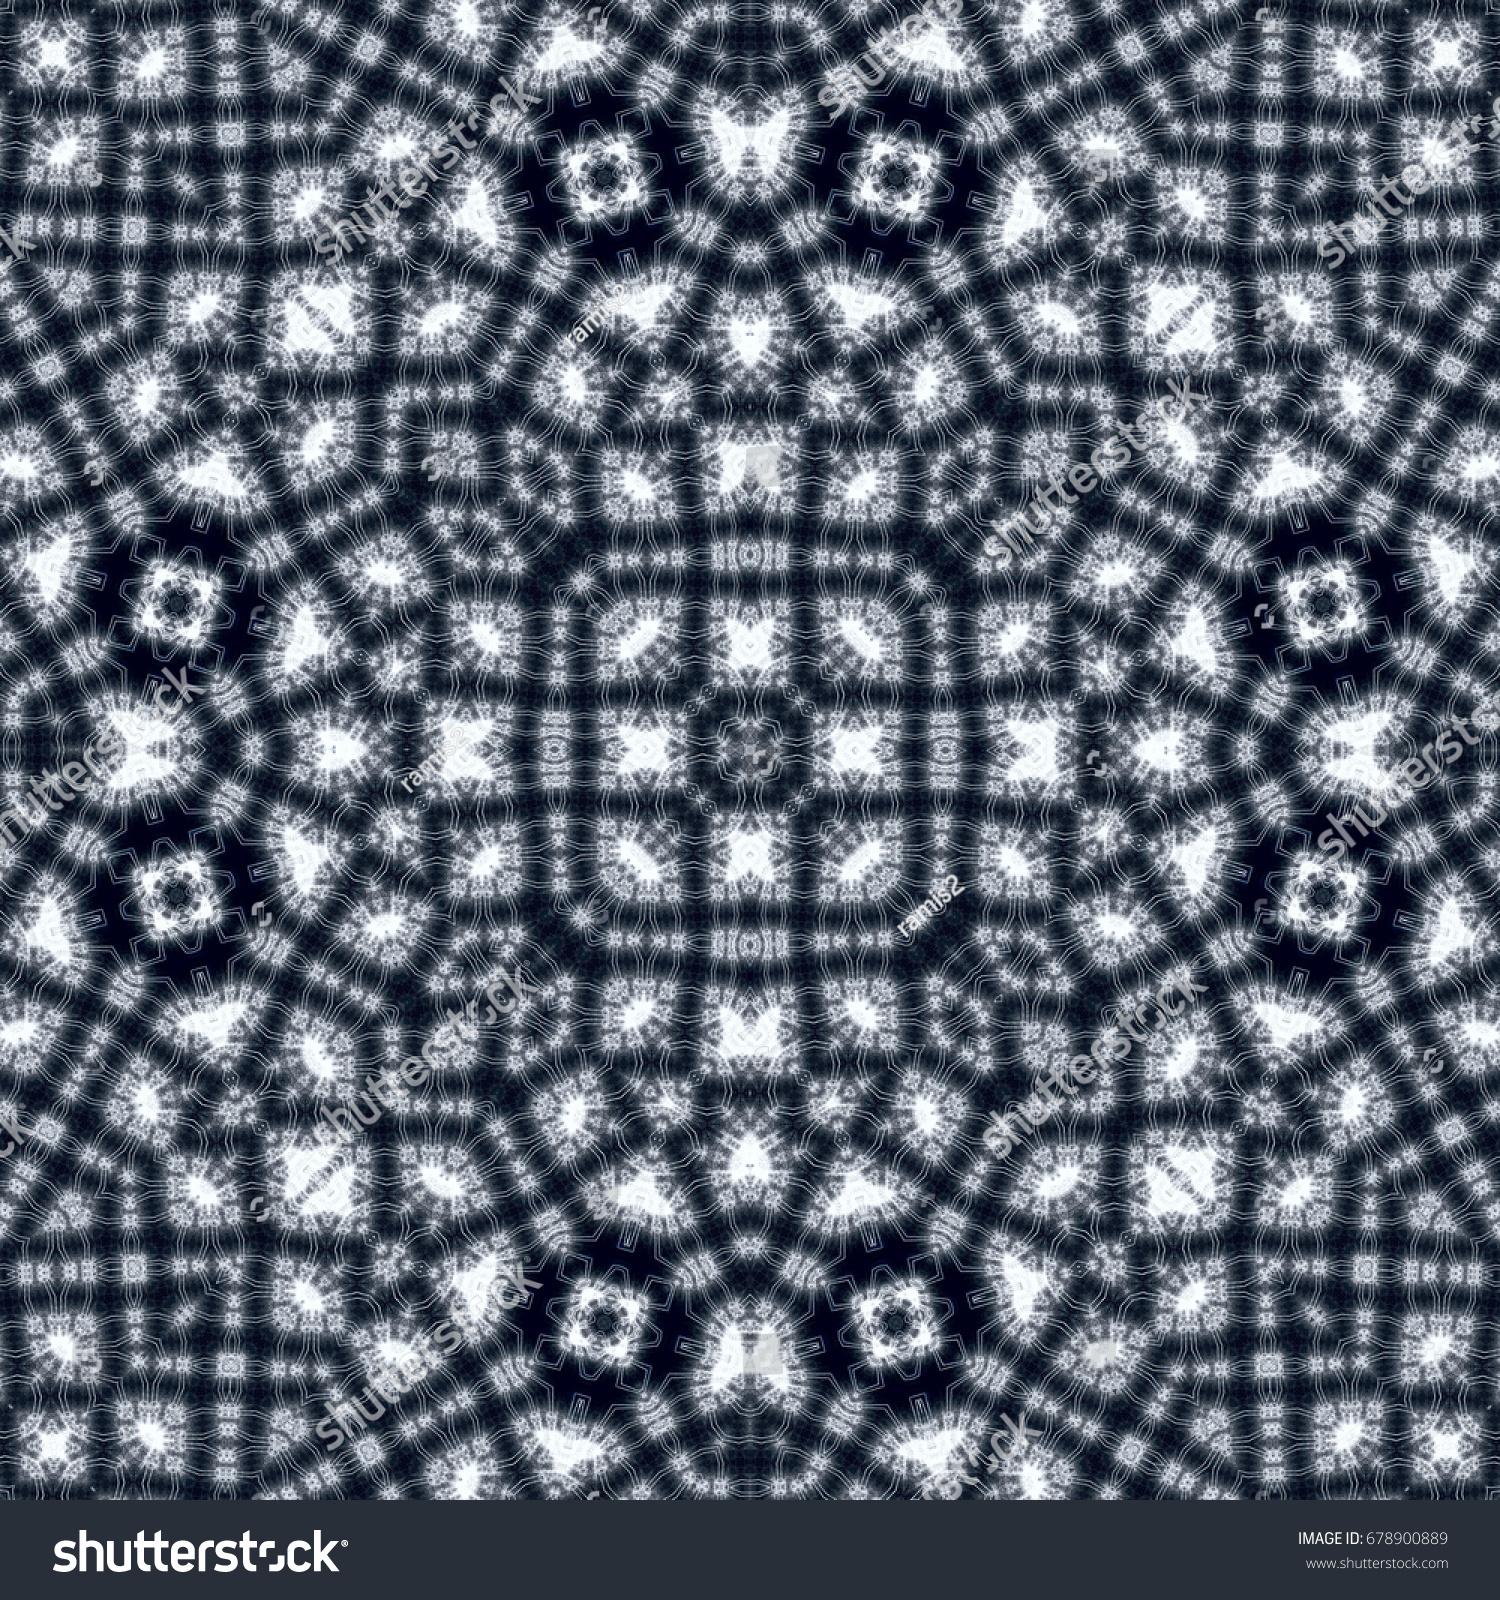 Seamless abstract wallpaper pattern, fractal tiles | EZ Canvas